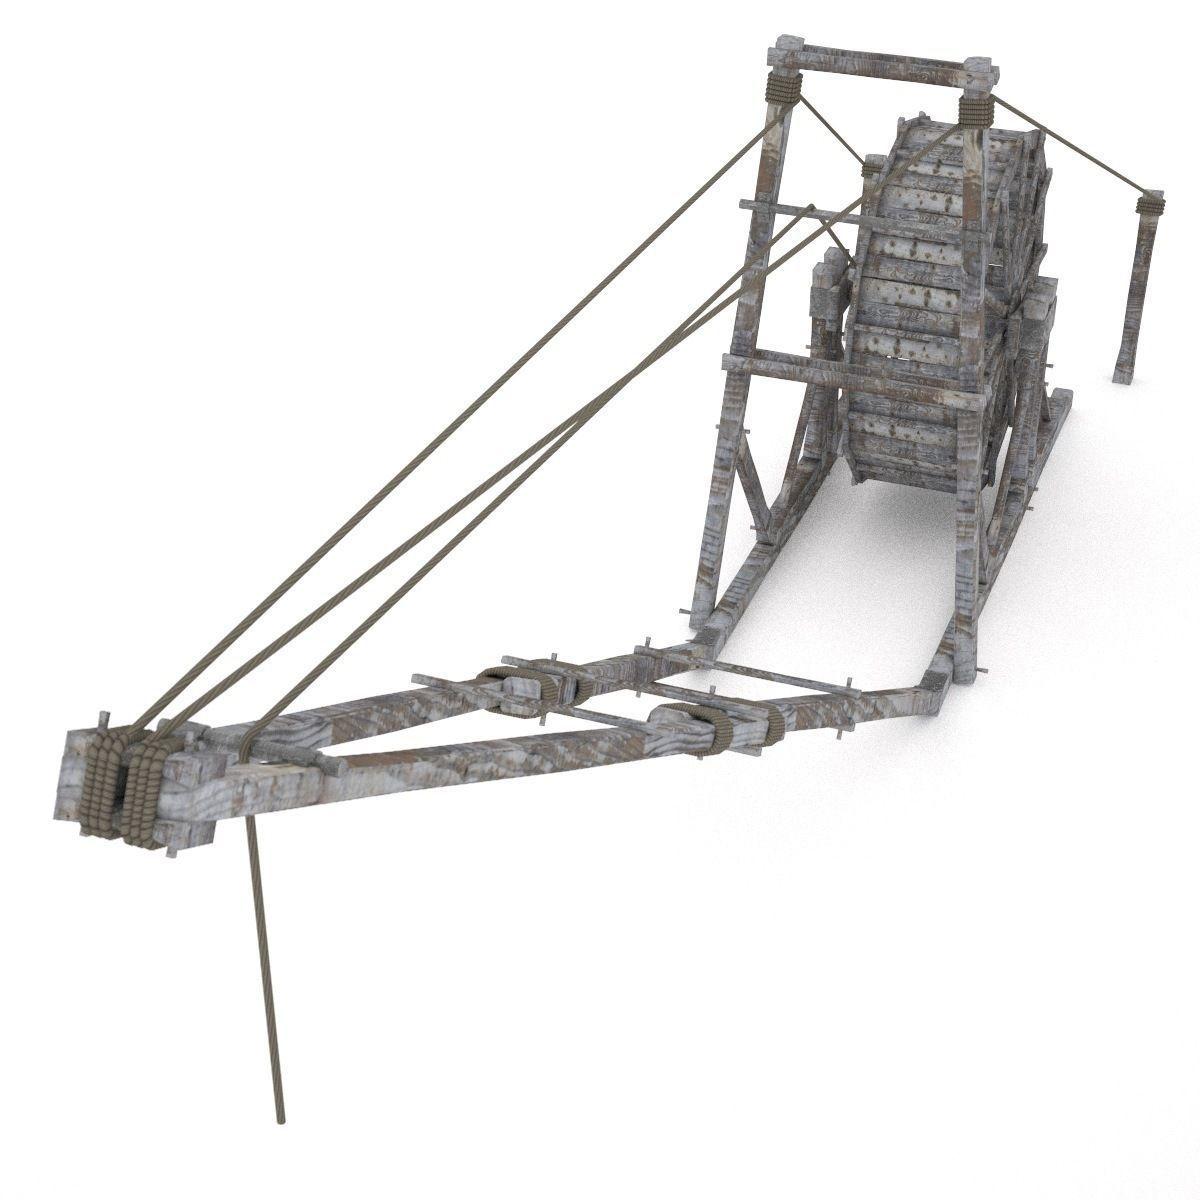 Old Wooden Crane 3d Model Obj 3ds Fbx Hrc Xsi Dae Skp Cgtrader Com